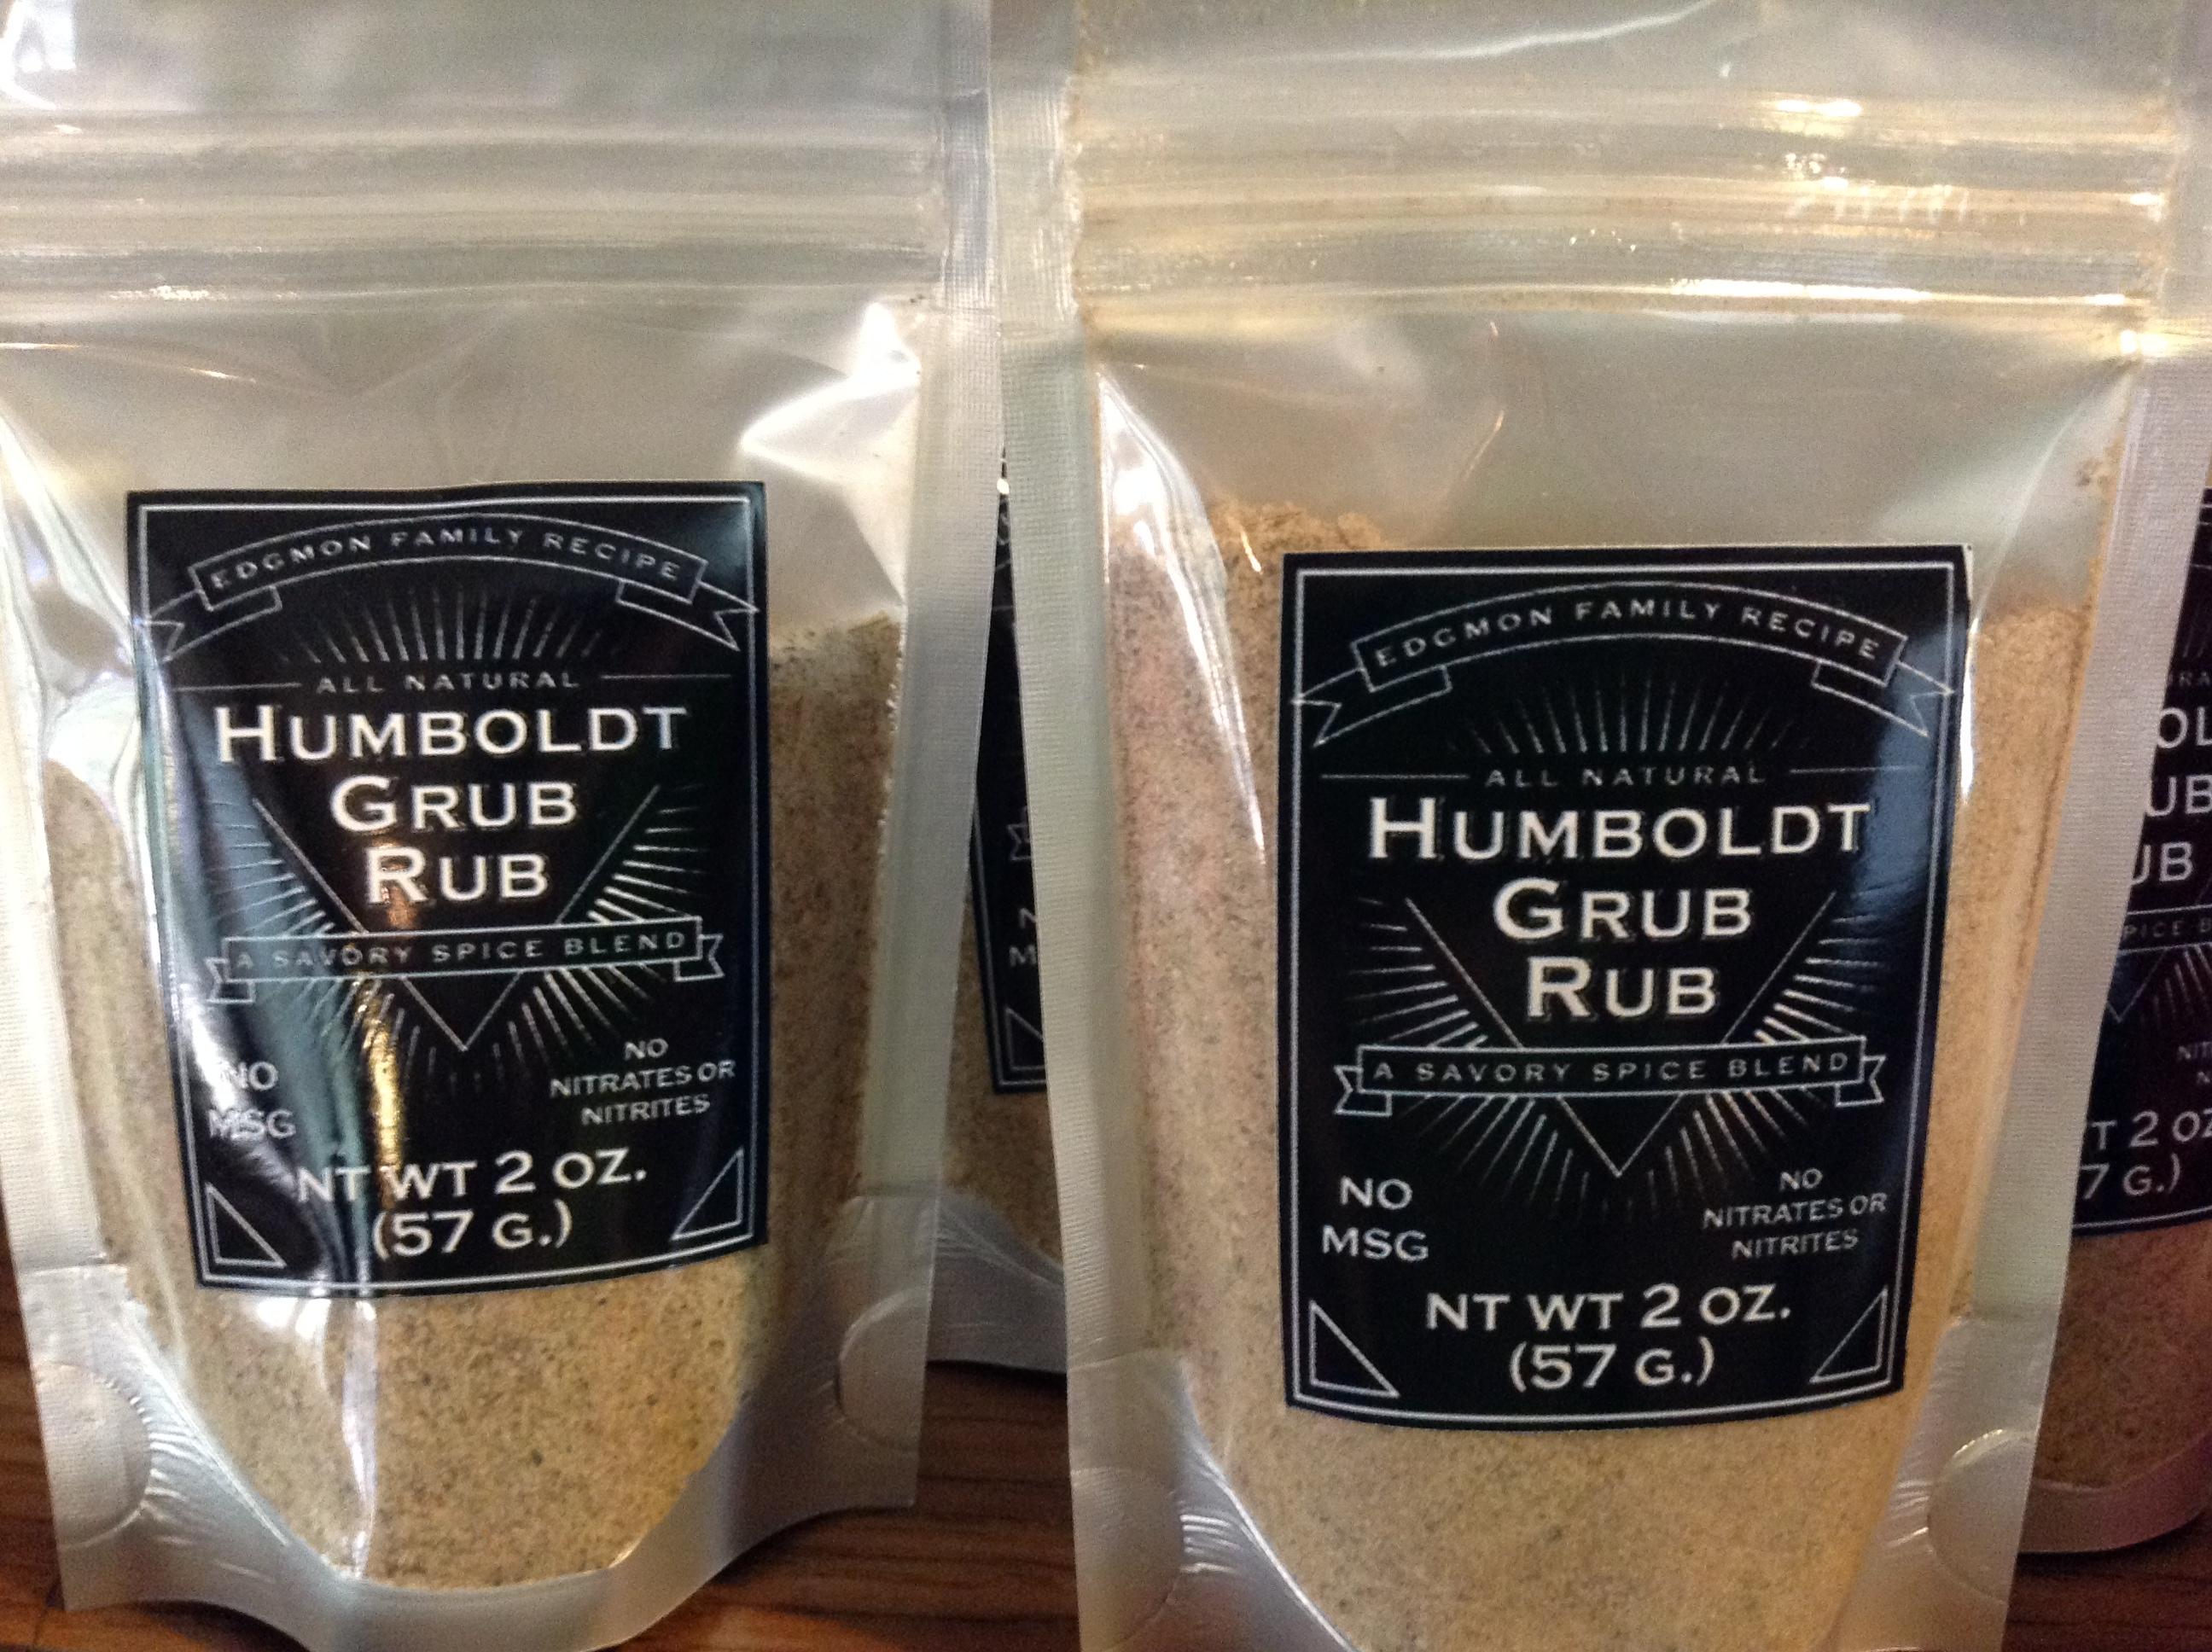 Humboldt Grub Rub